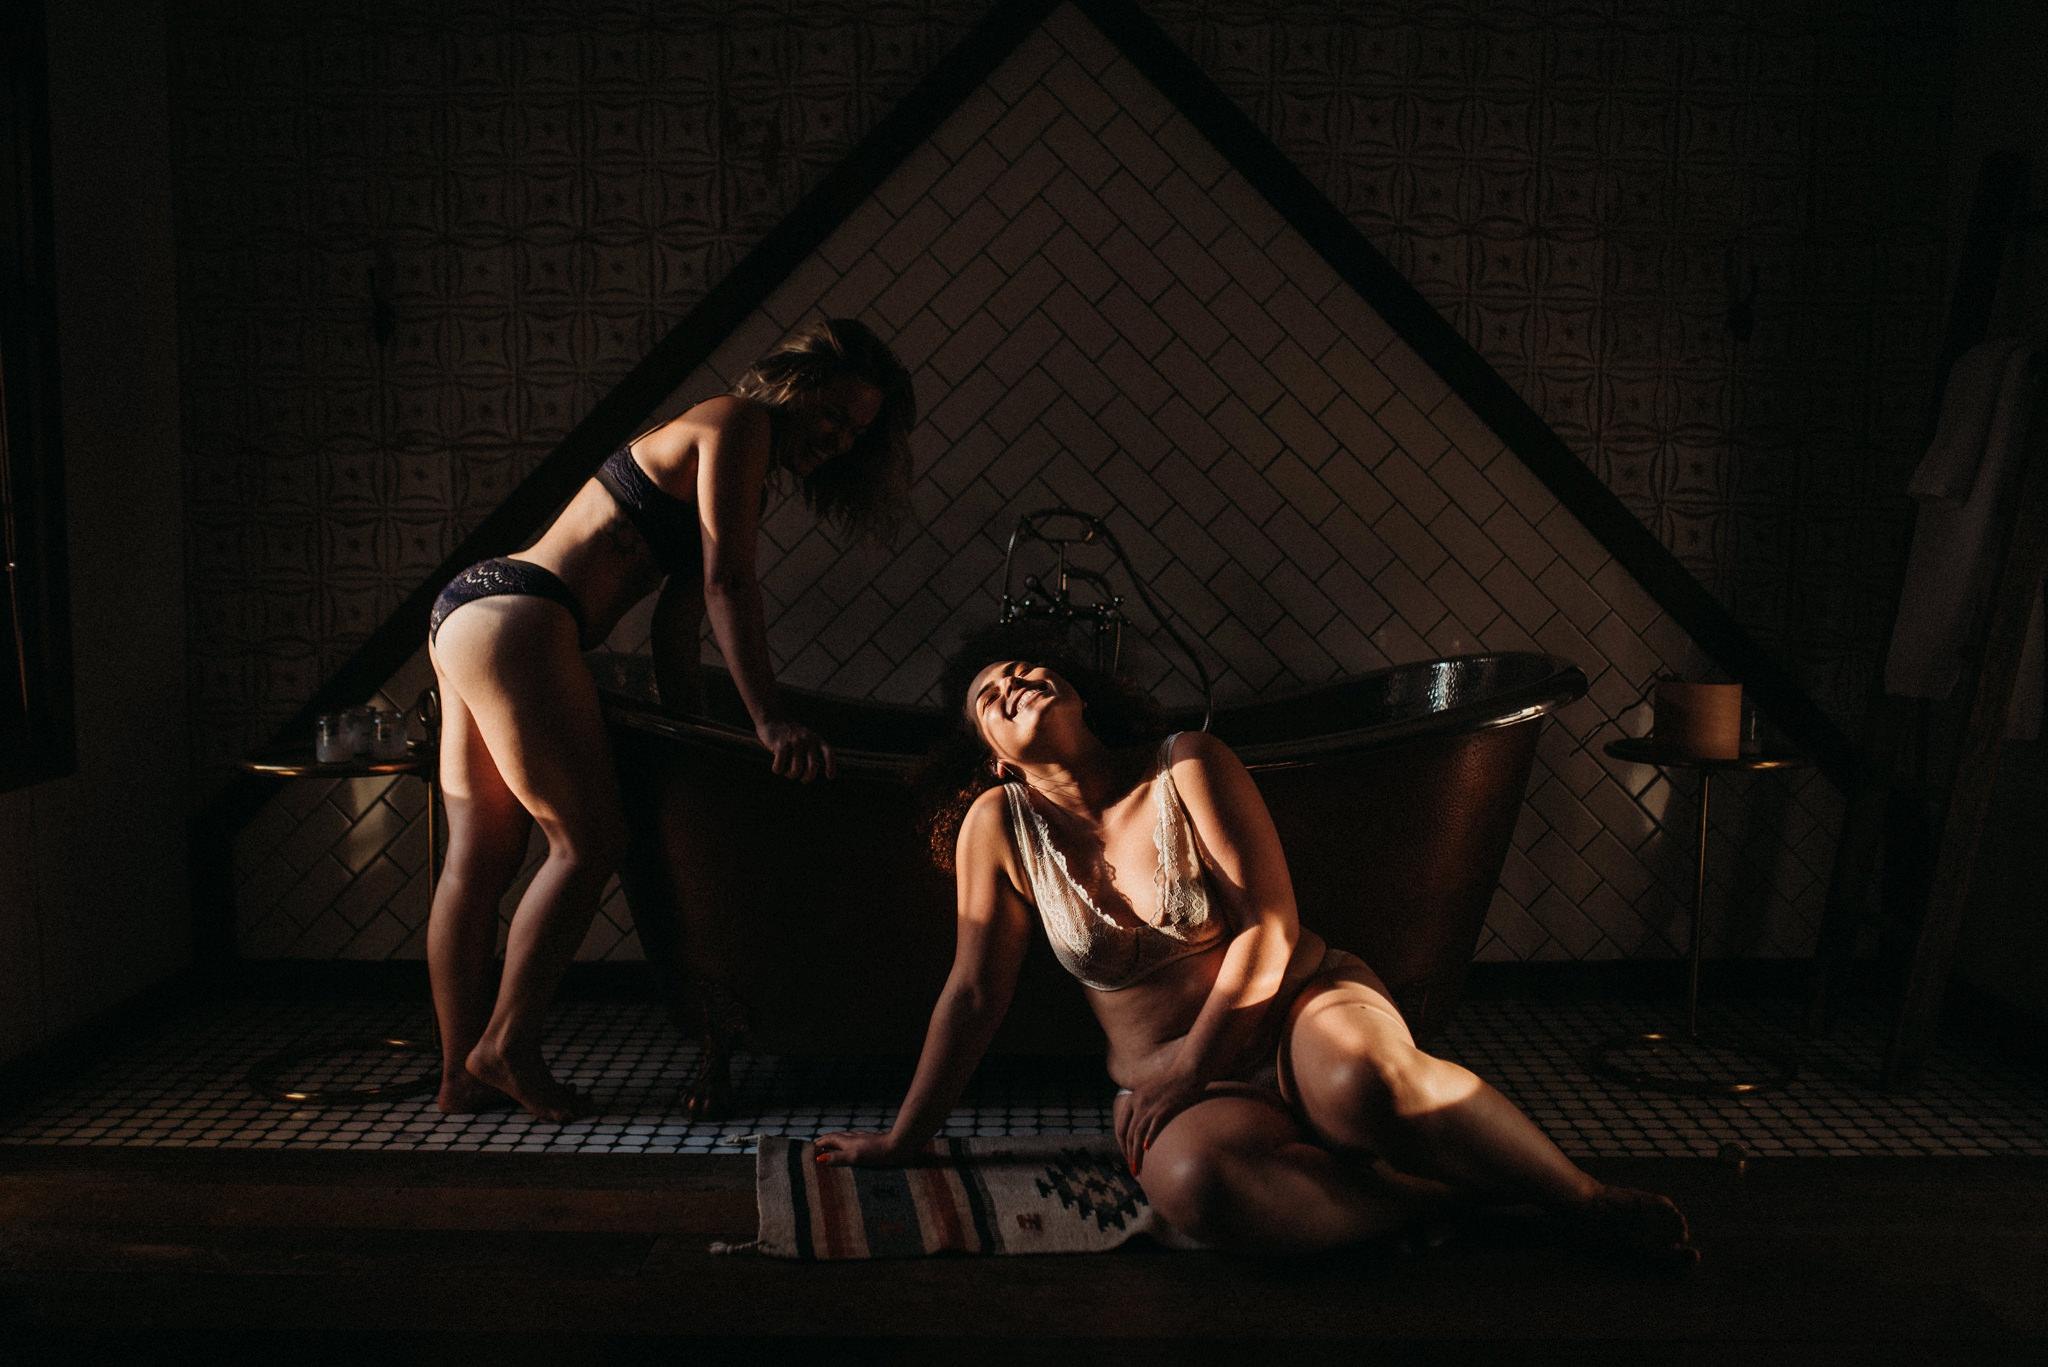 twyla jones photography - treasure coast florida - intimate couples session urban cowboy b&b | brooklyn New York_0037.jpg